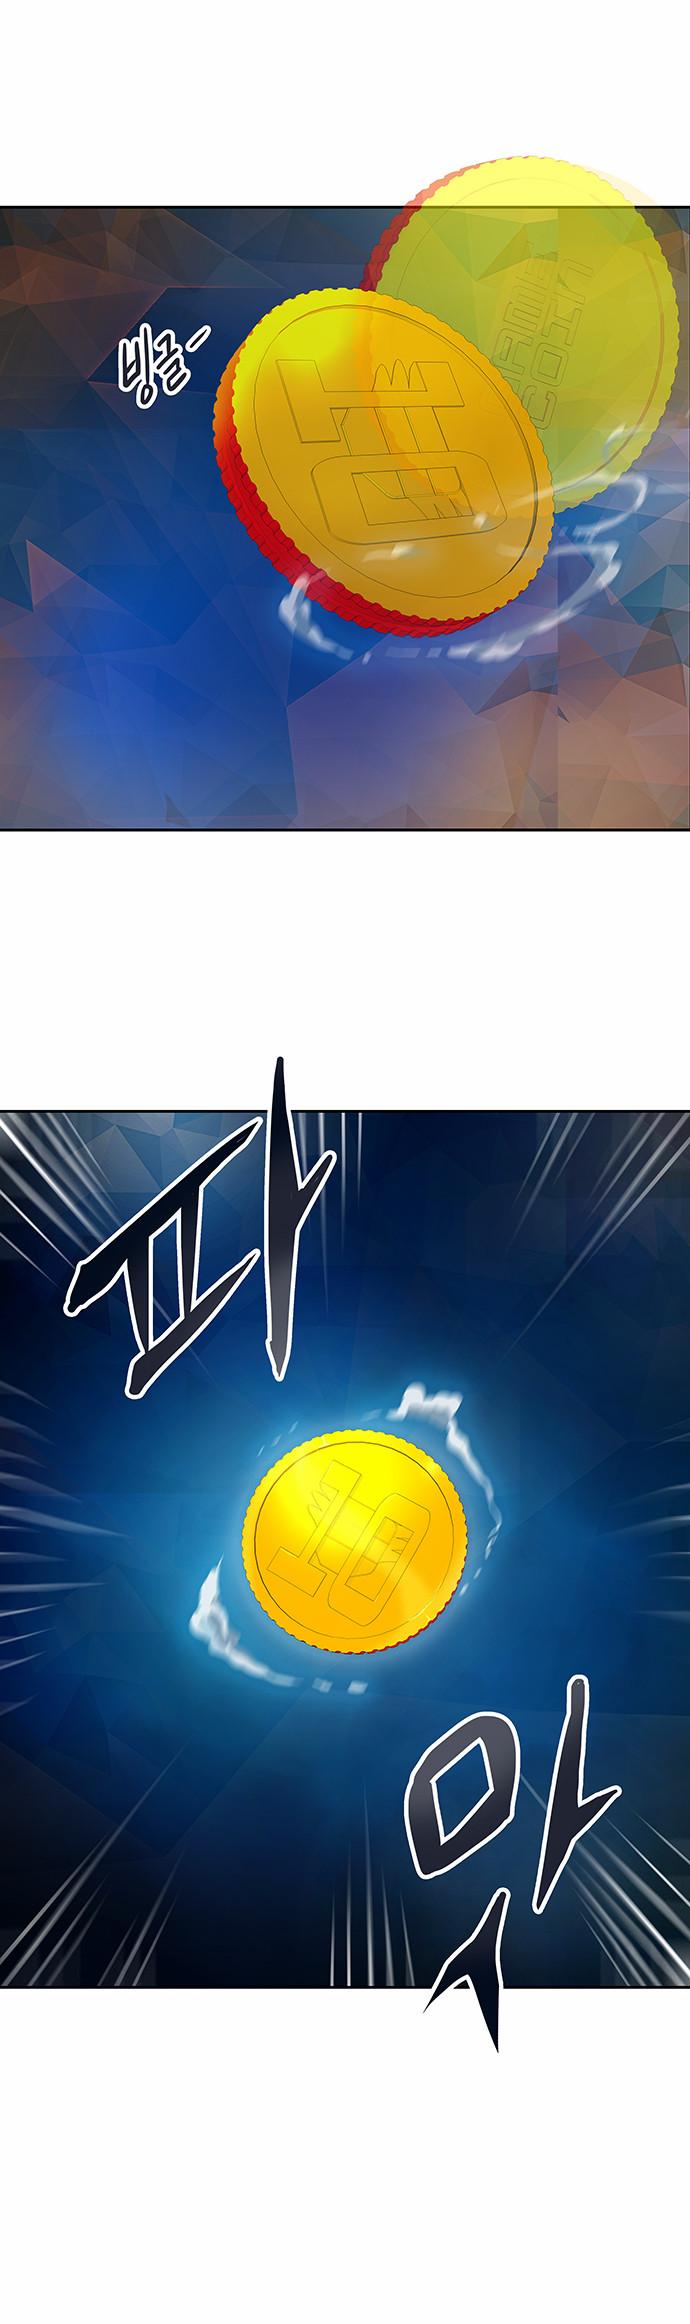 http://c5.ninemanga.com/es_manga/21/149/439526/894b53e0119e515f0f1128a38aac3e66.jpg Page 4